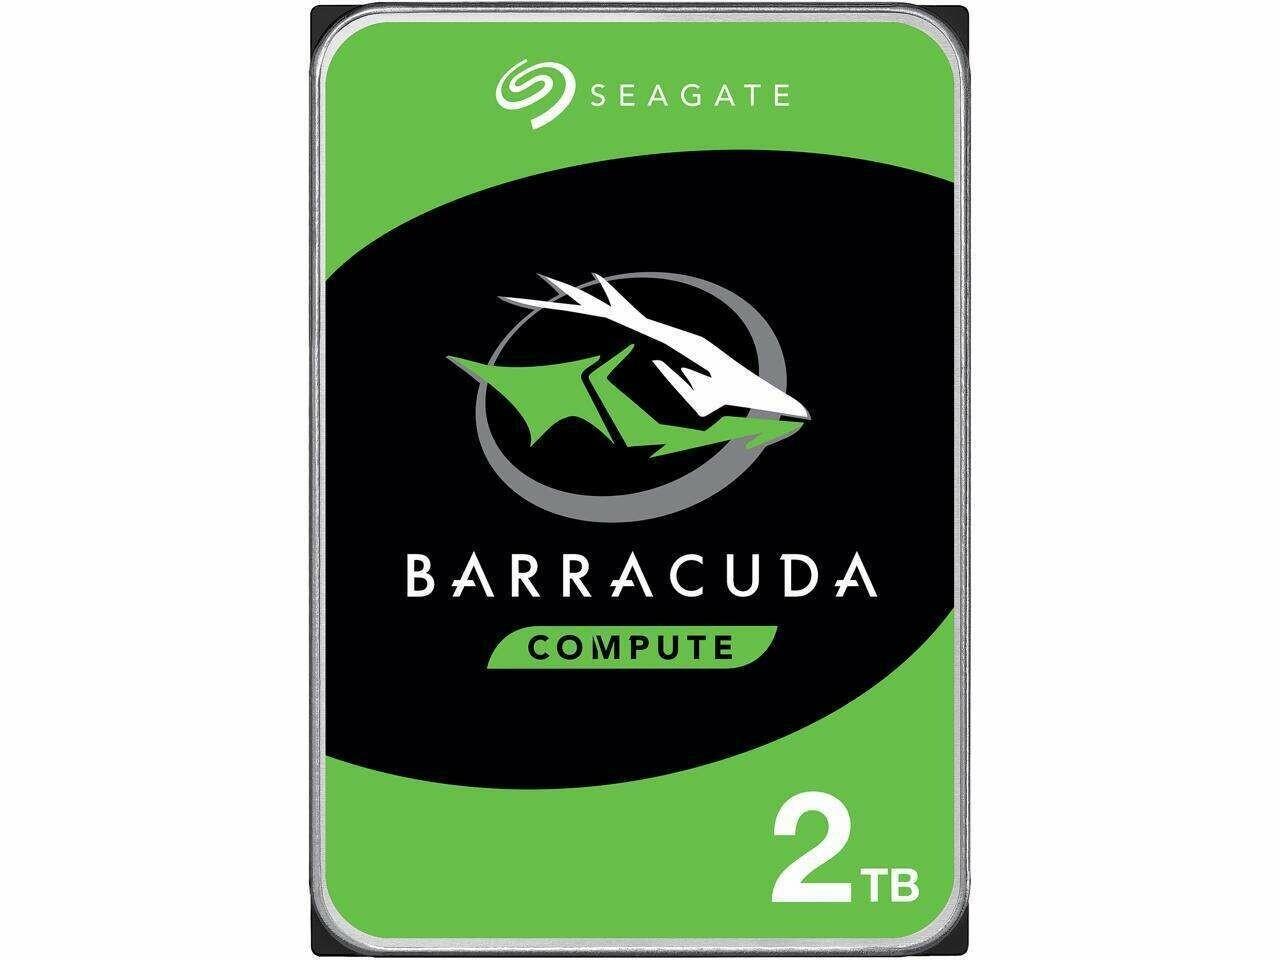 "Seagate BarraCuda ST2000DM008 2TB 7200 RPM 256MB Cache SATA 6.0Gb/s 3.5"" Hard Drive"